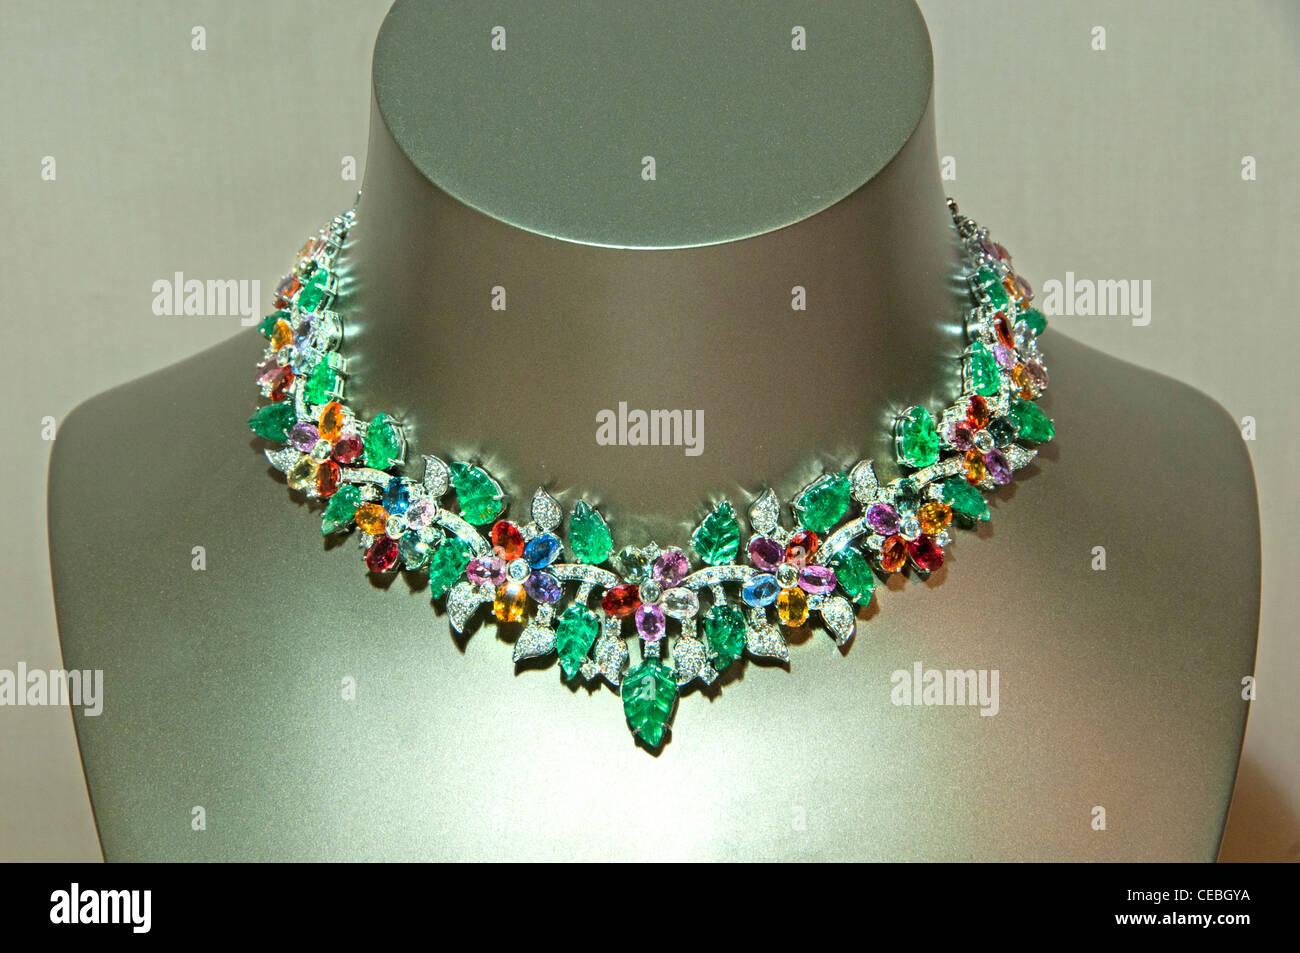 Garland Place Vendome Jeweler Jewel Paris France - Stock Image